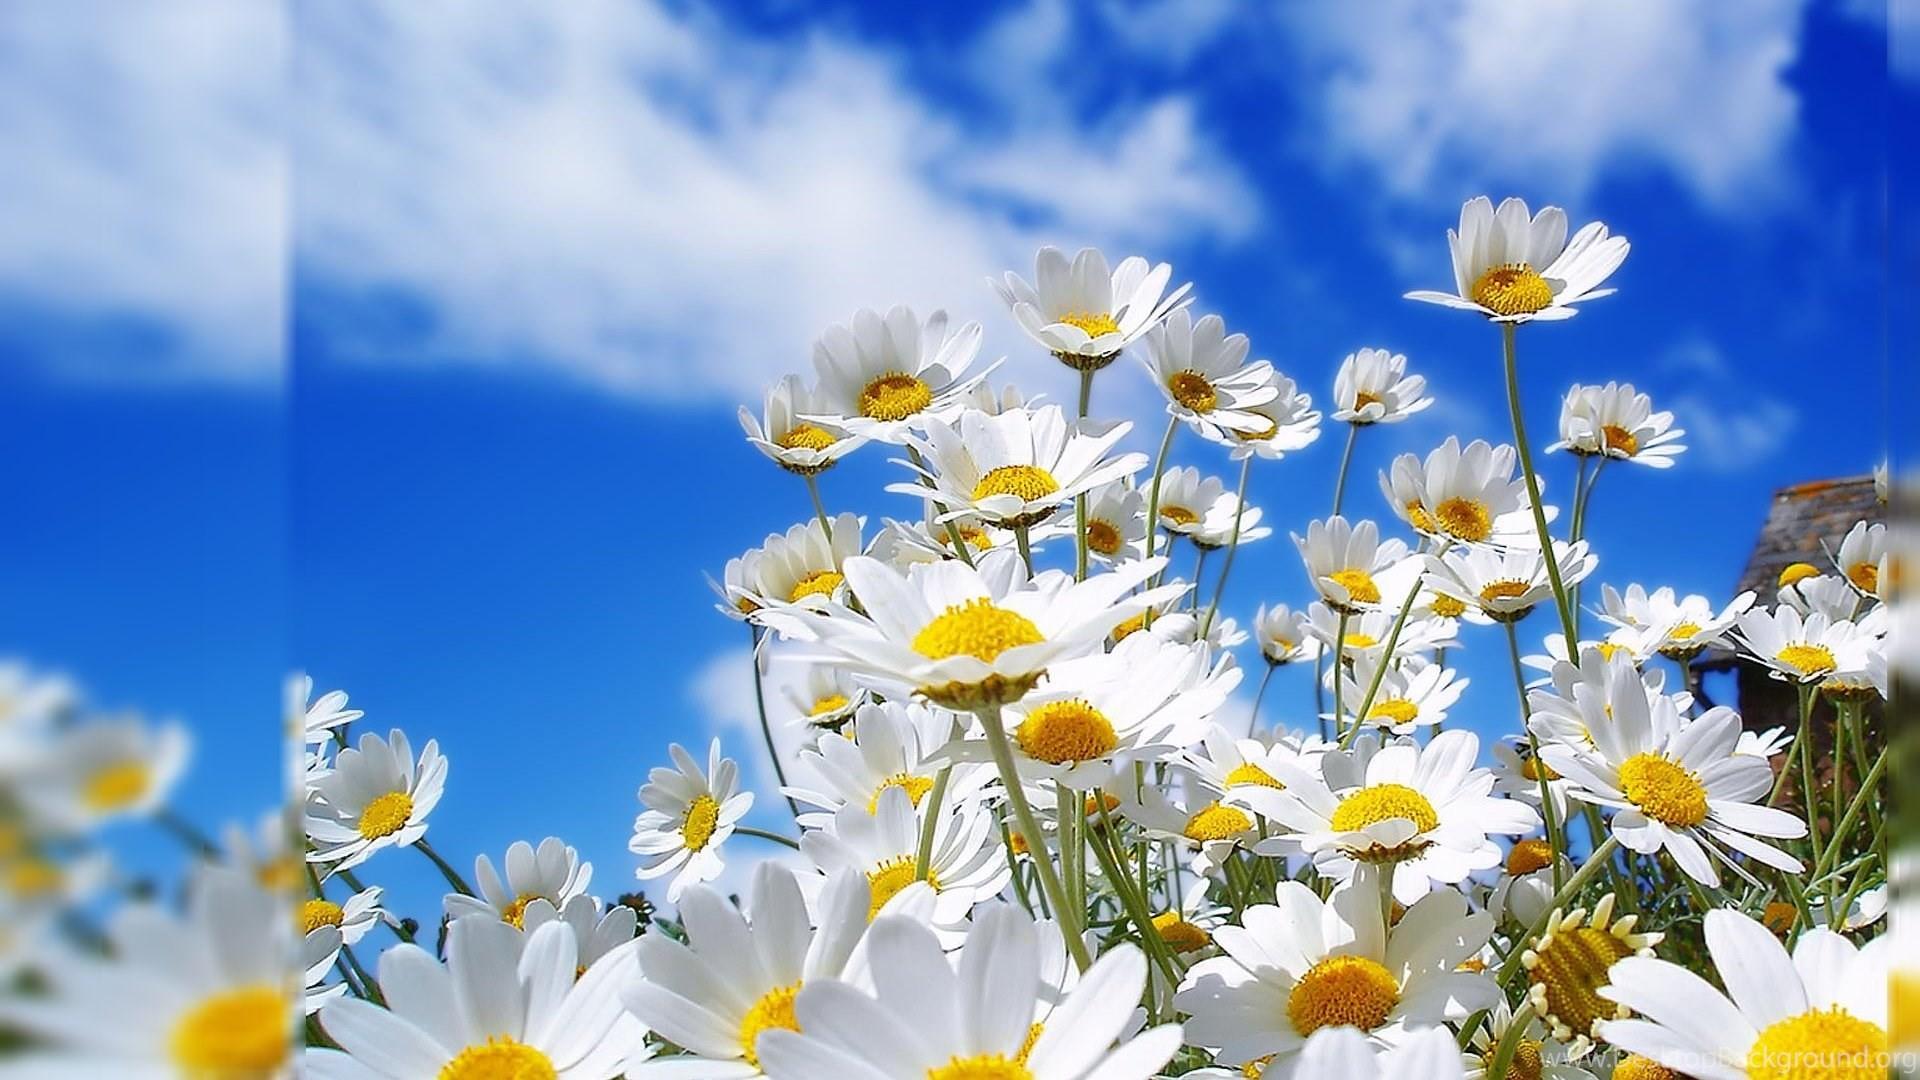 Flower Desktop Backgrounds 1